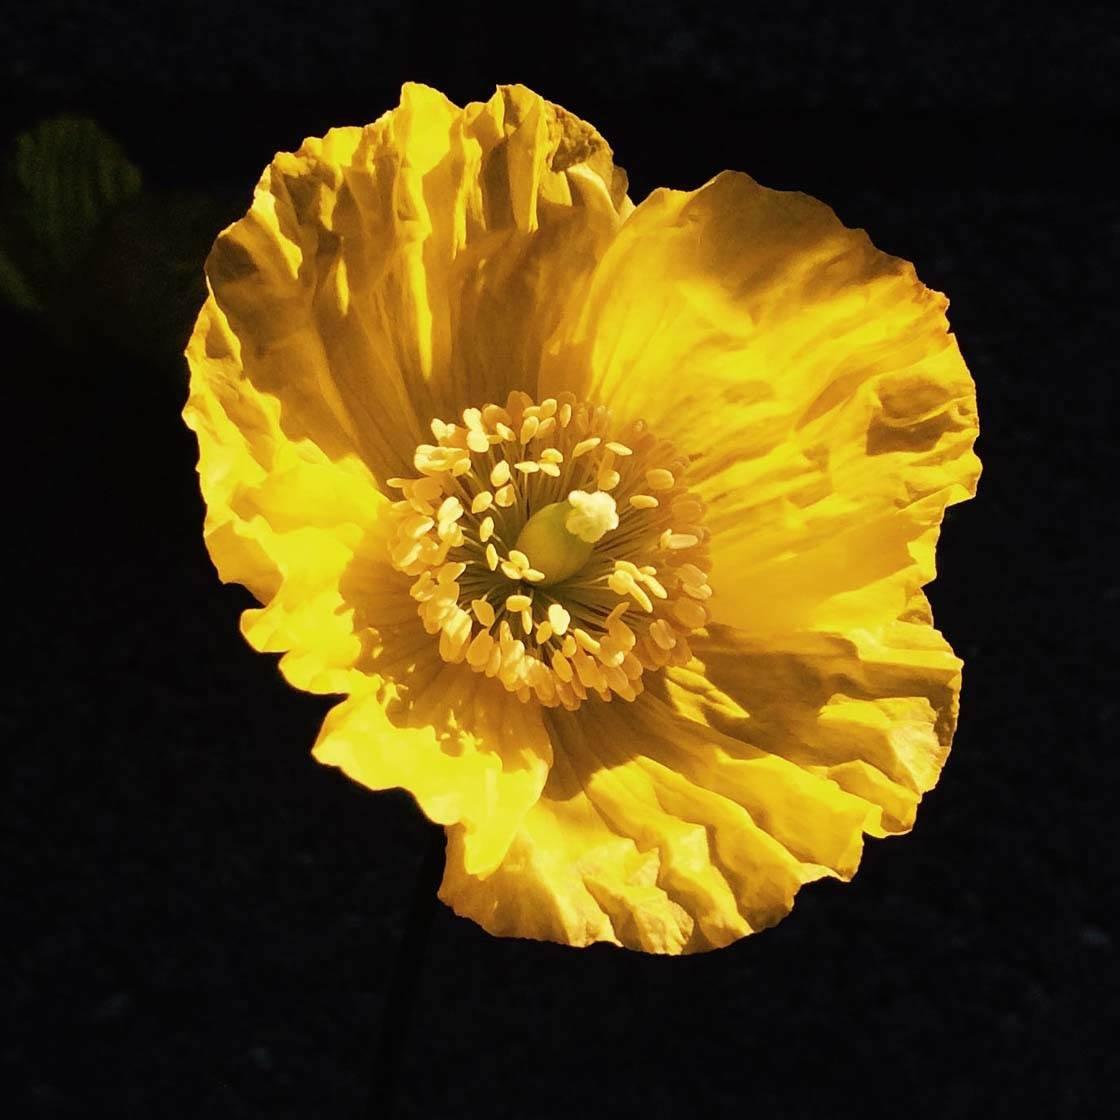 iPhone Flower Photography 32 no script